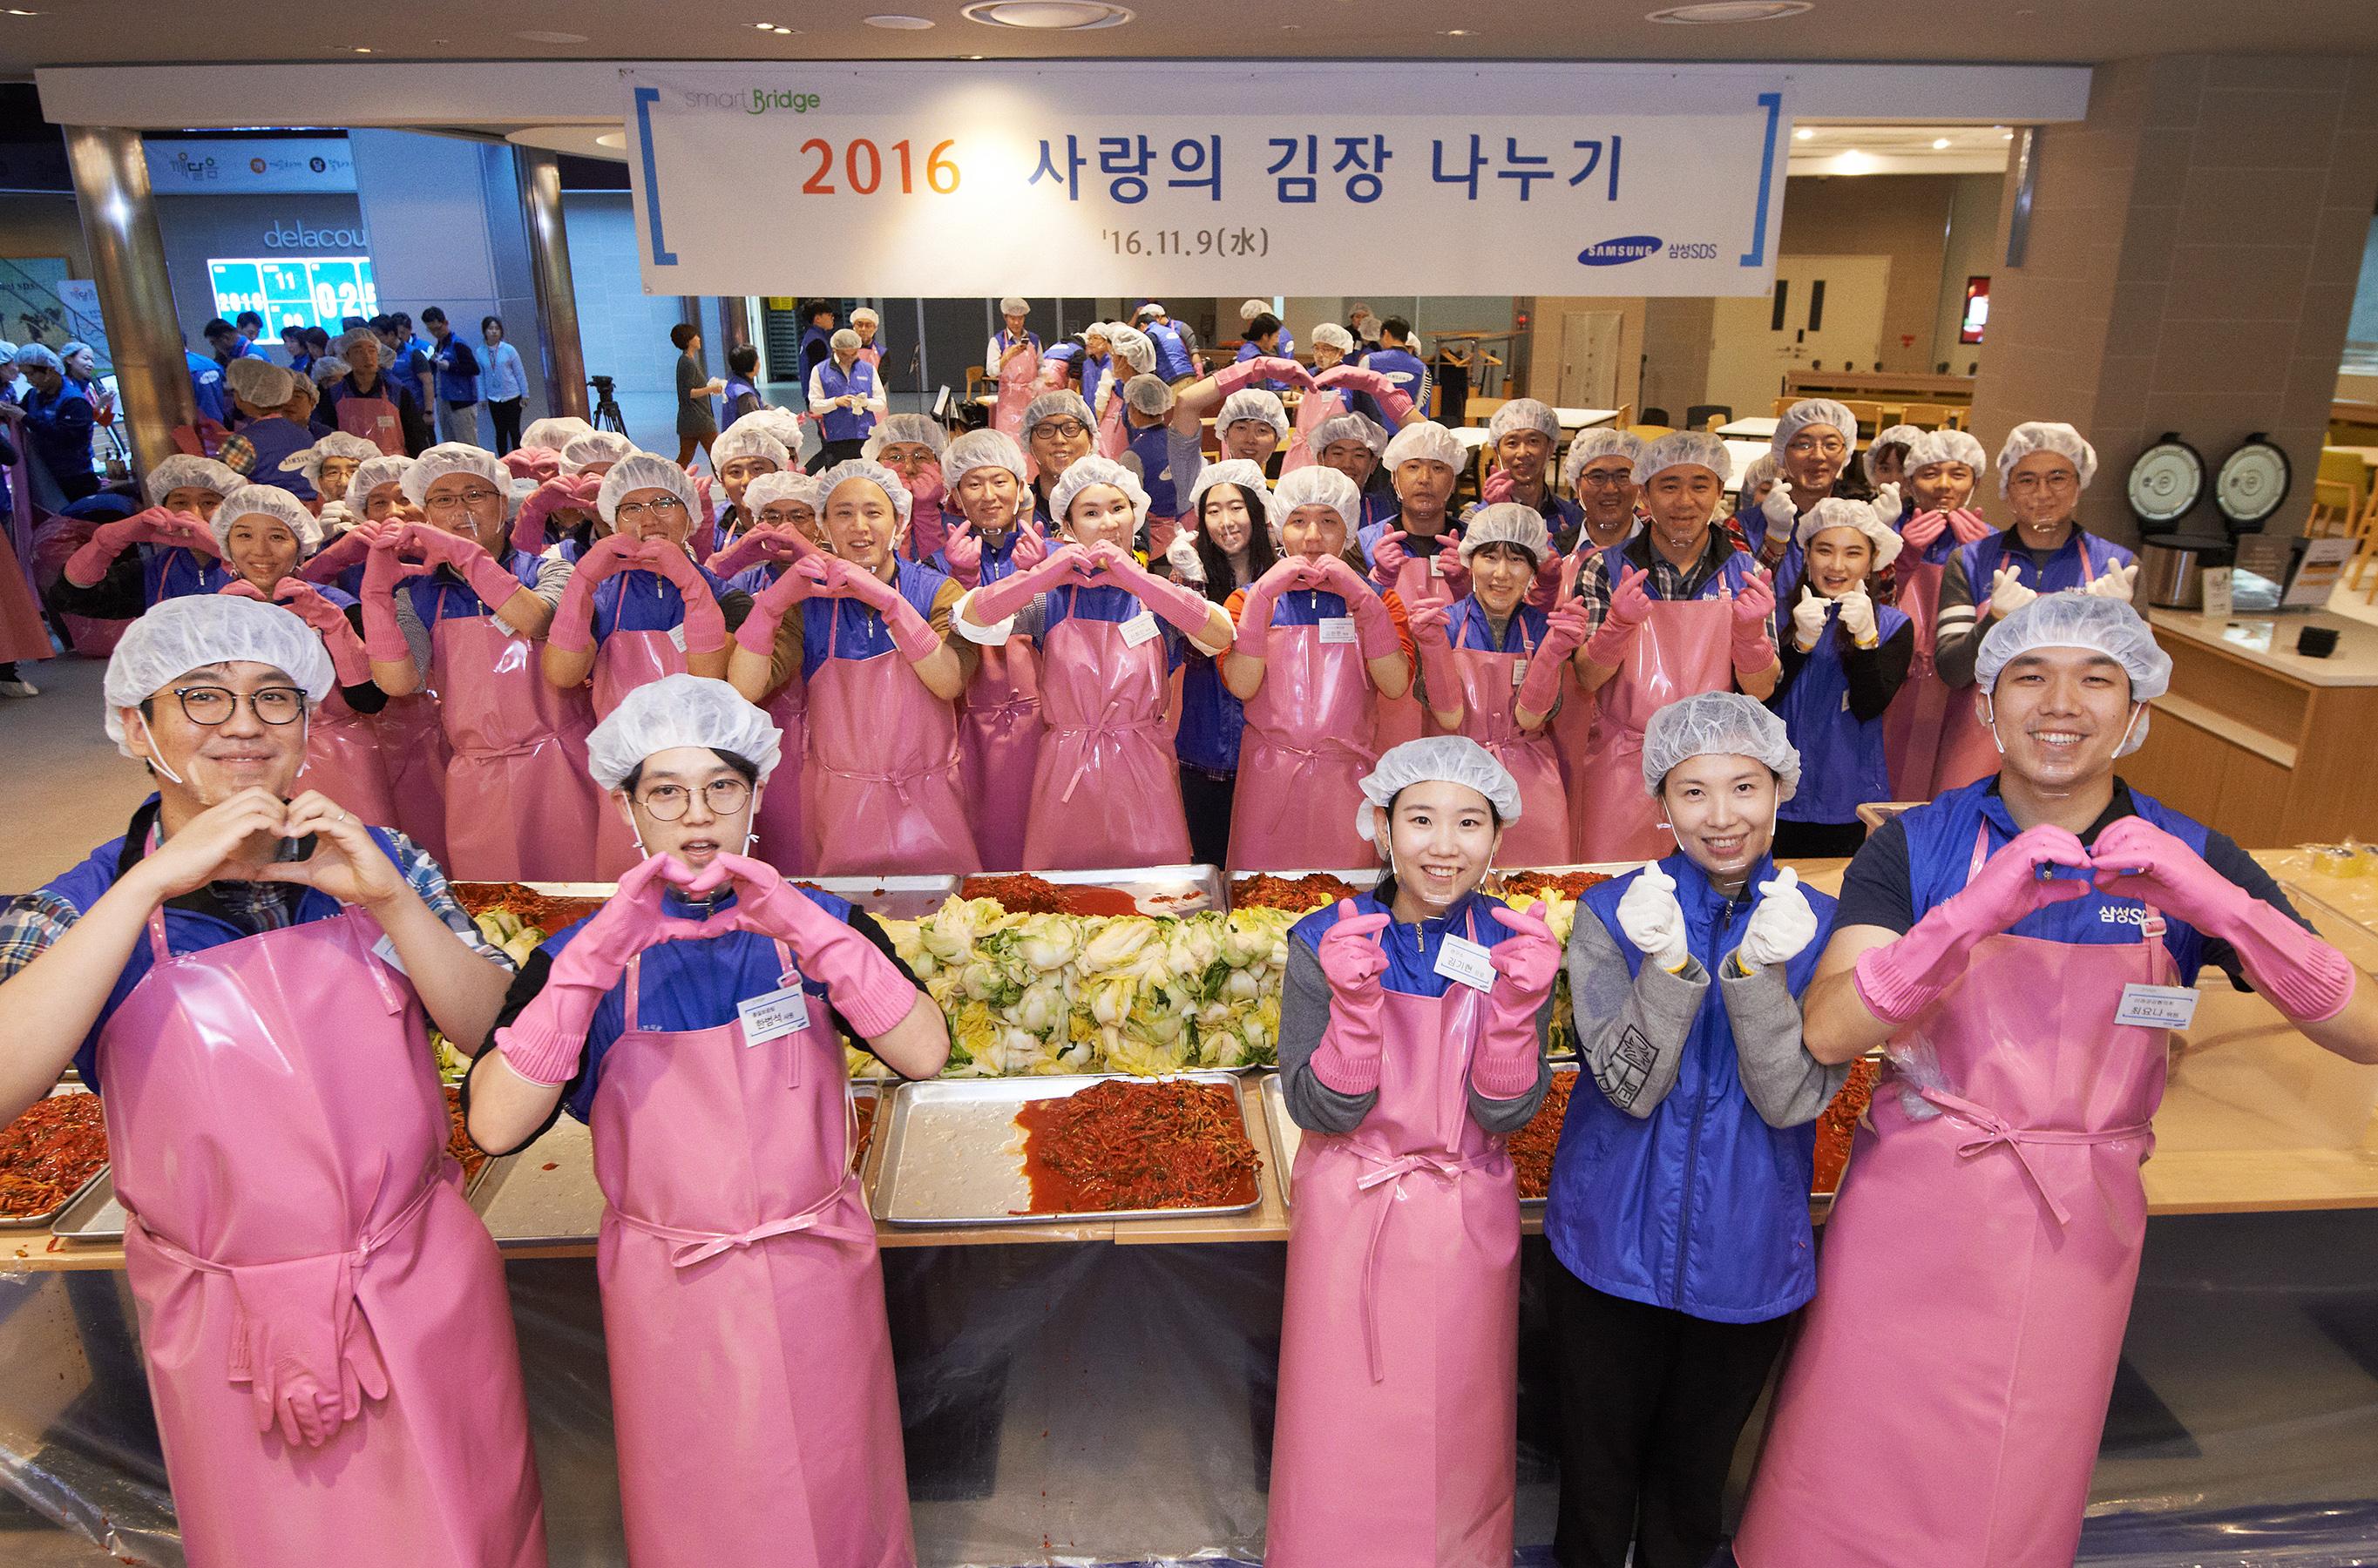 Kimchi Sharing Event of Love